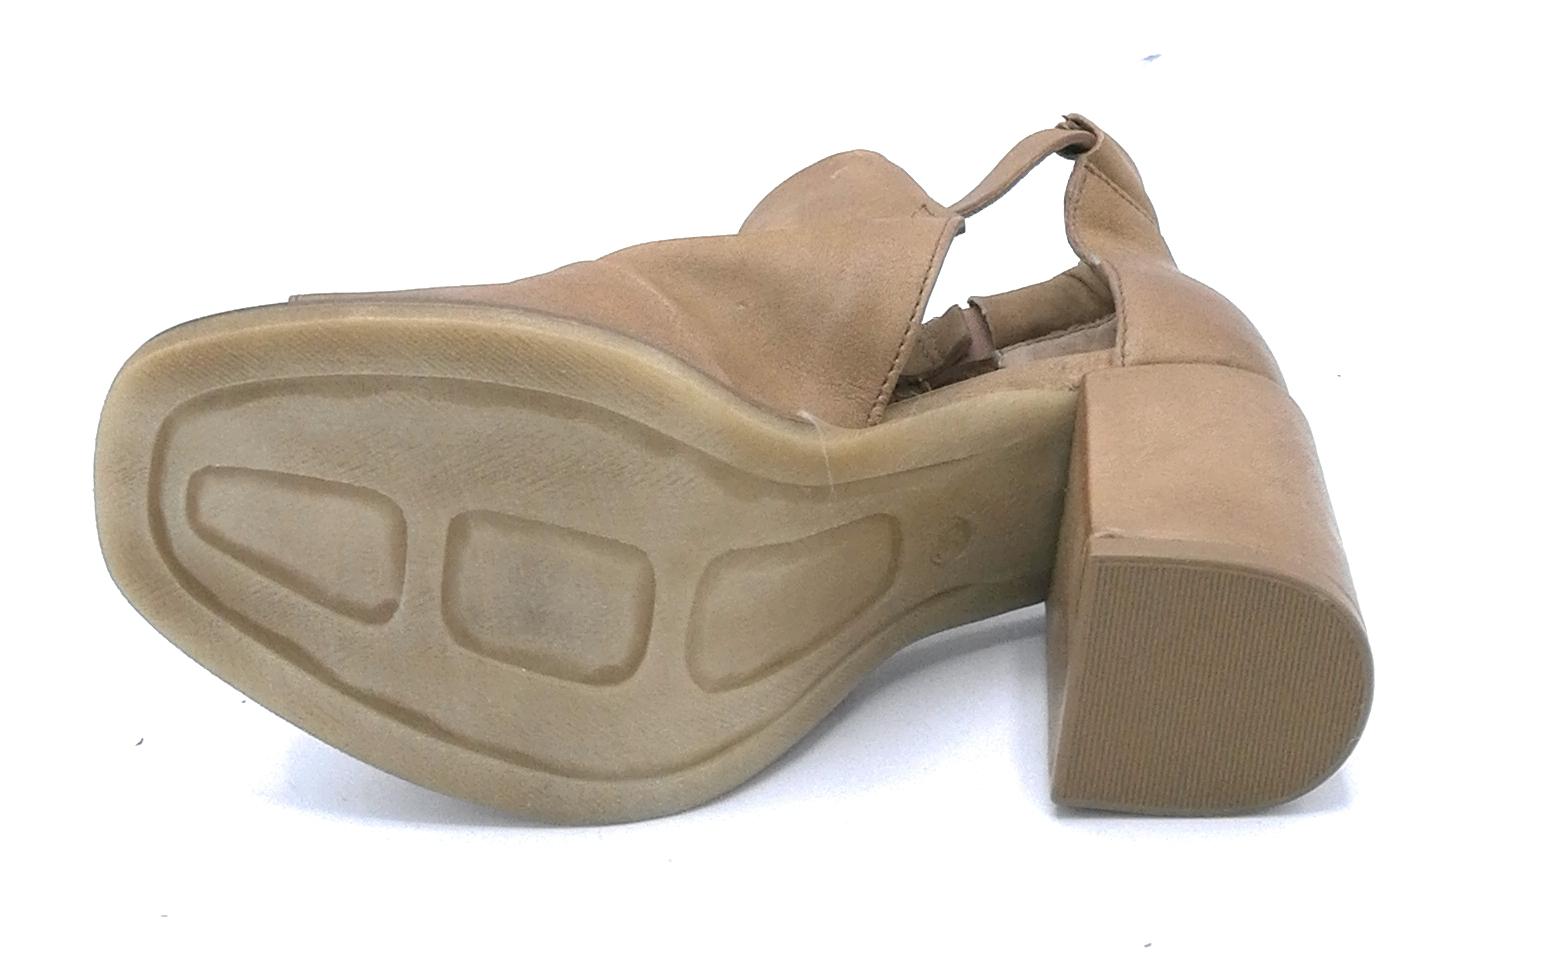 Cm Tacco 862002 Pelle Cinturino Nero 7 Sandalo Mjus Sabbia Largo yvm0wONn8